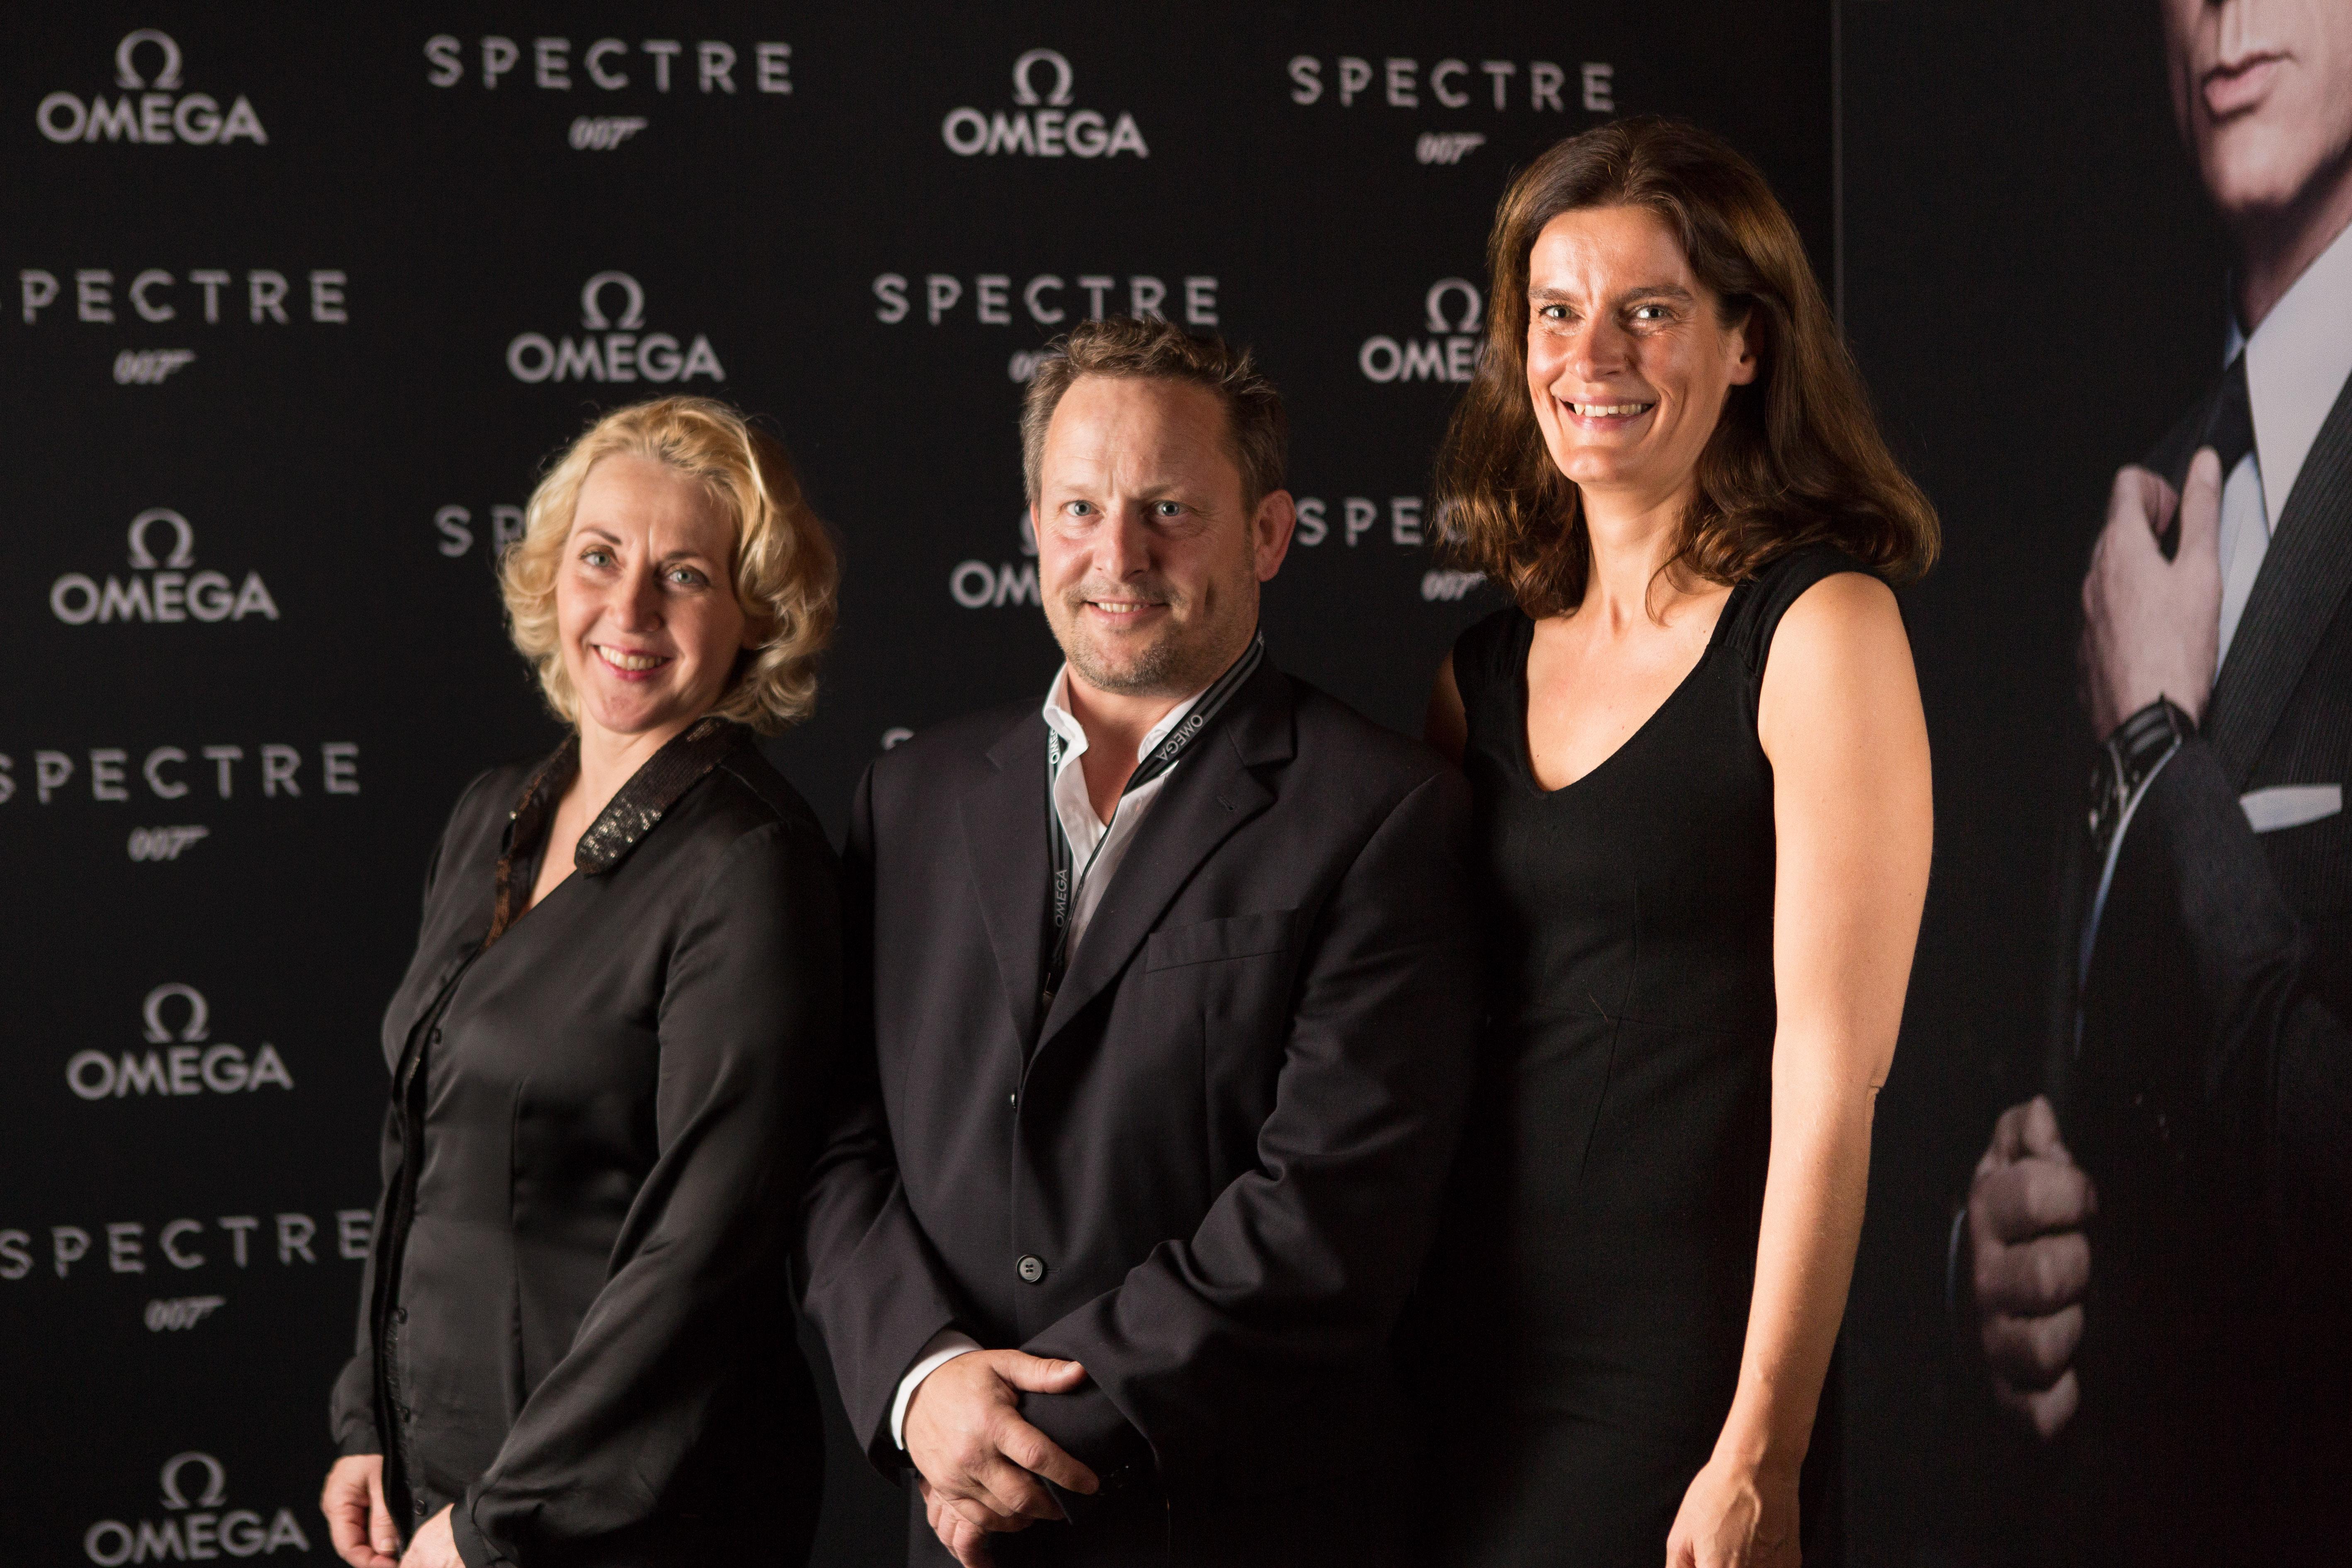 spectre-omega wall-60